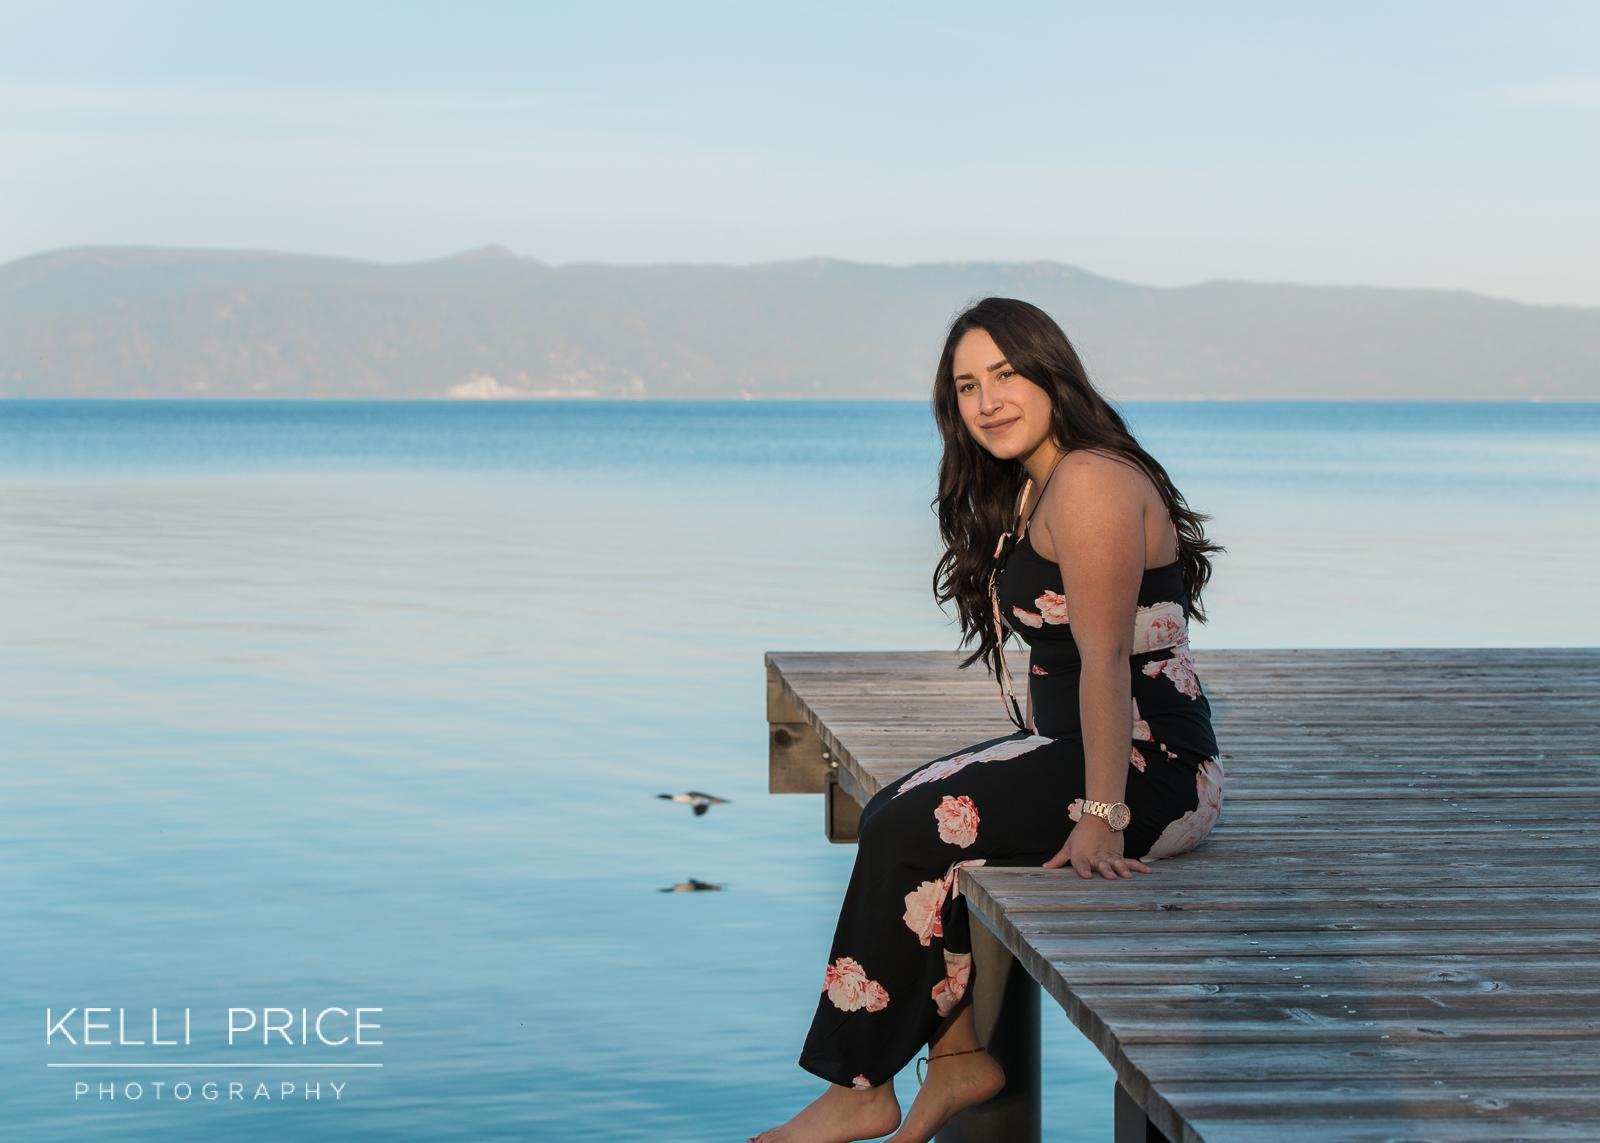 JaureguiSenior20_KelliPricePhotography_LakeTahoeCaliforniaMay2016.jpg